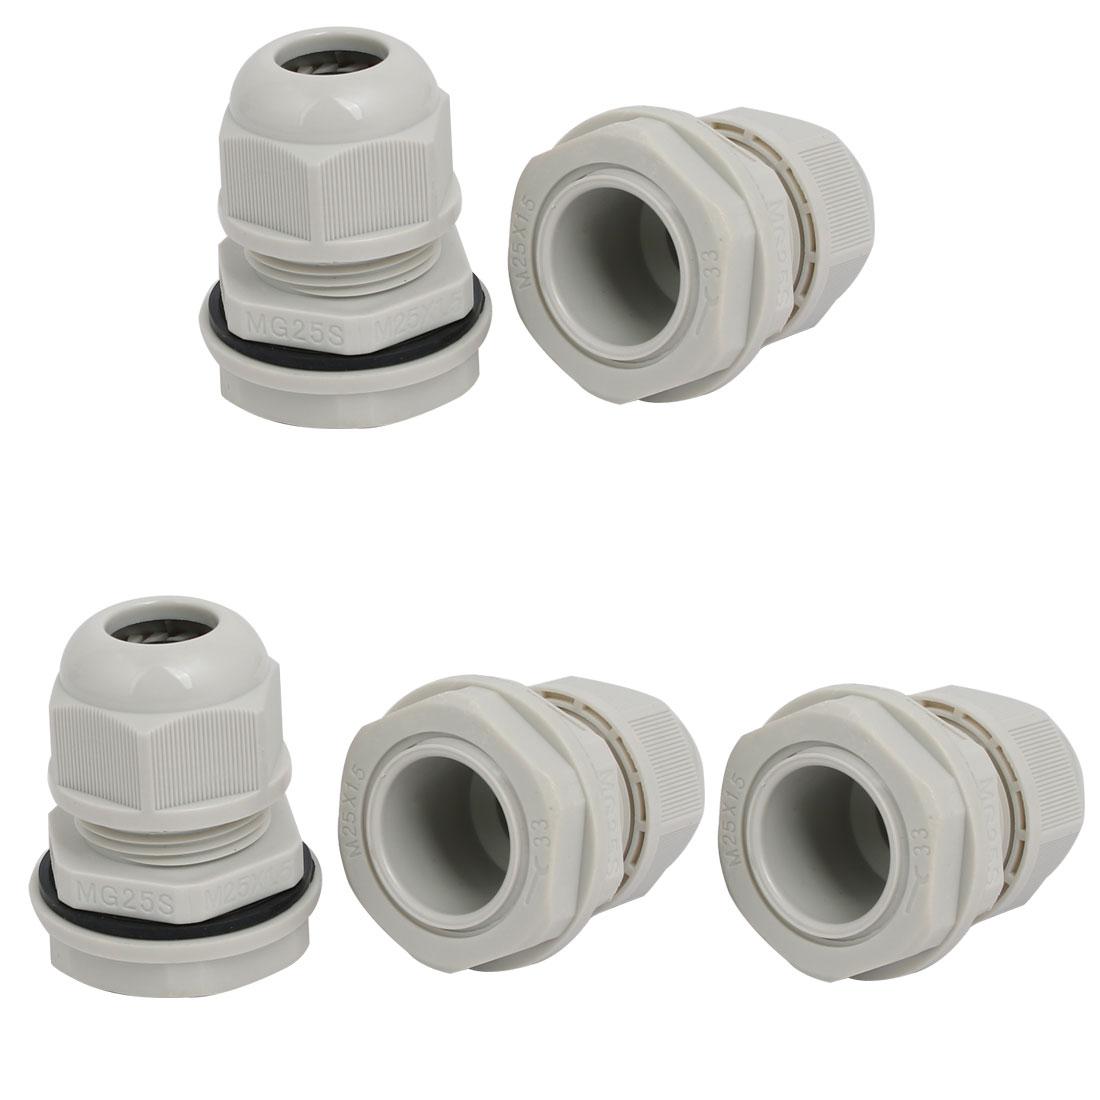 M25x1.5mm 3mm-5.5mm Range Nylon 4 Holes Adjustable Cables Gland Gray 5pcs